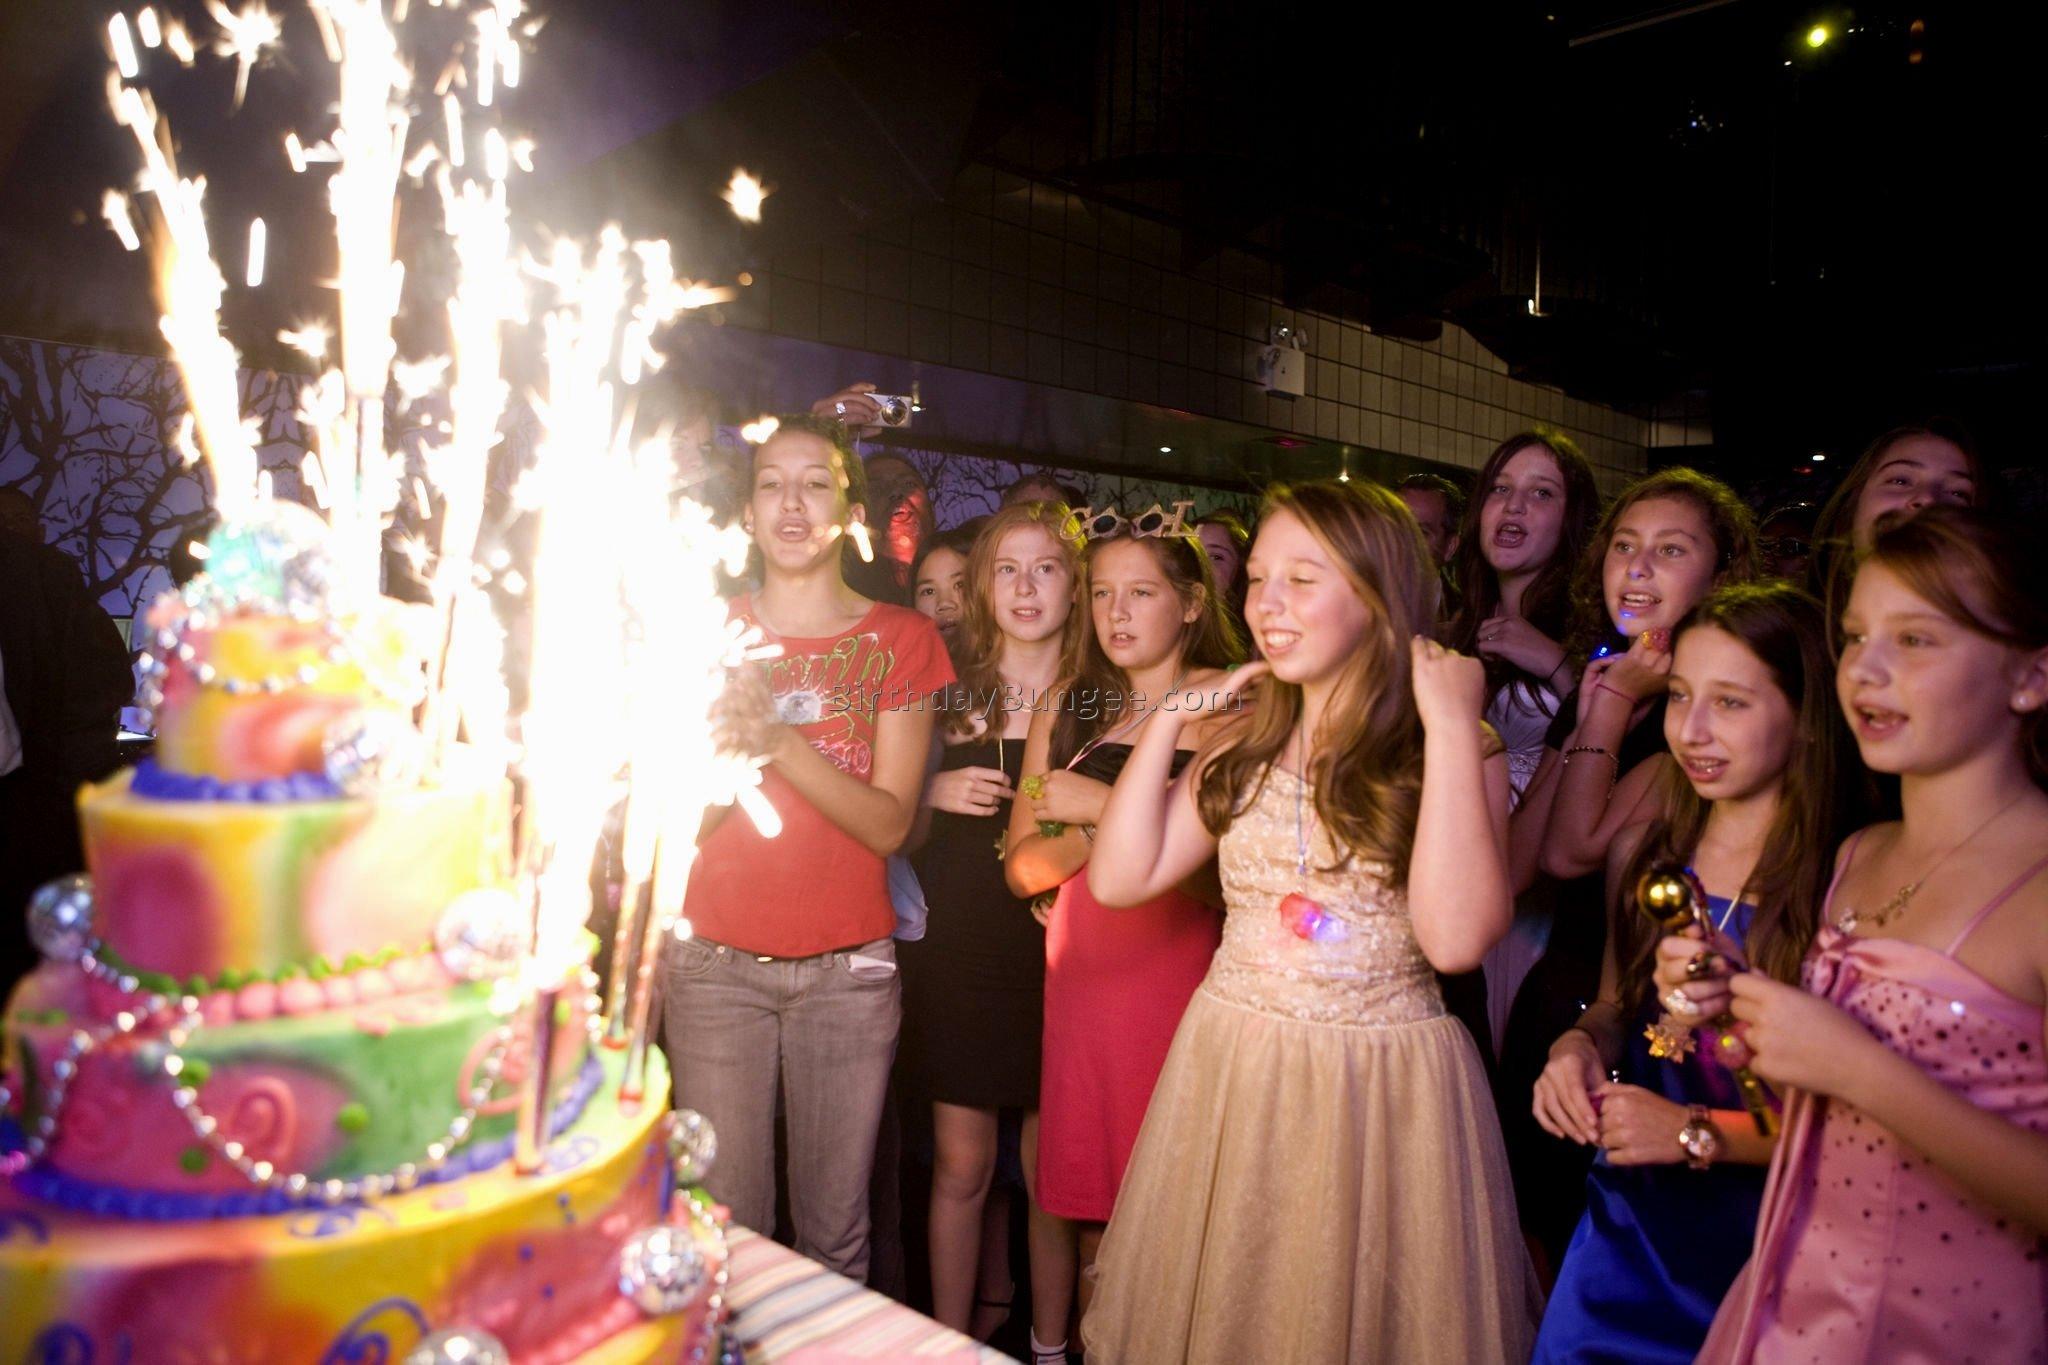 10 Awesome 13 Yr Old Birthday Party Ideas stylish 13 year old boy birthday party ideas ideas birthday ideas 2 2020